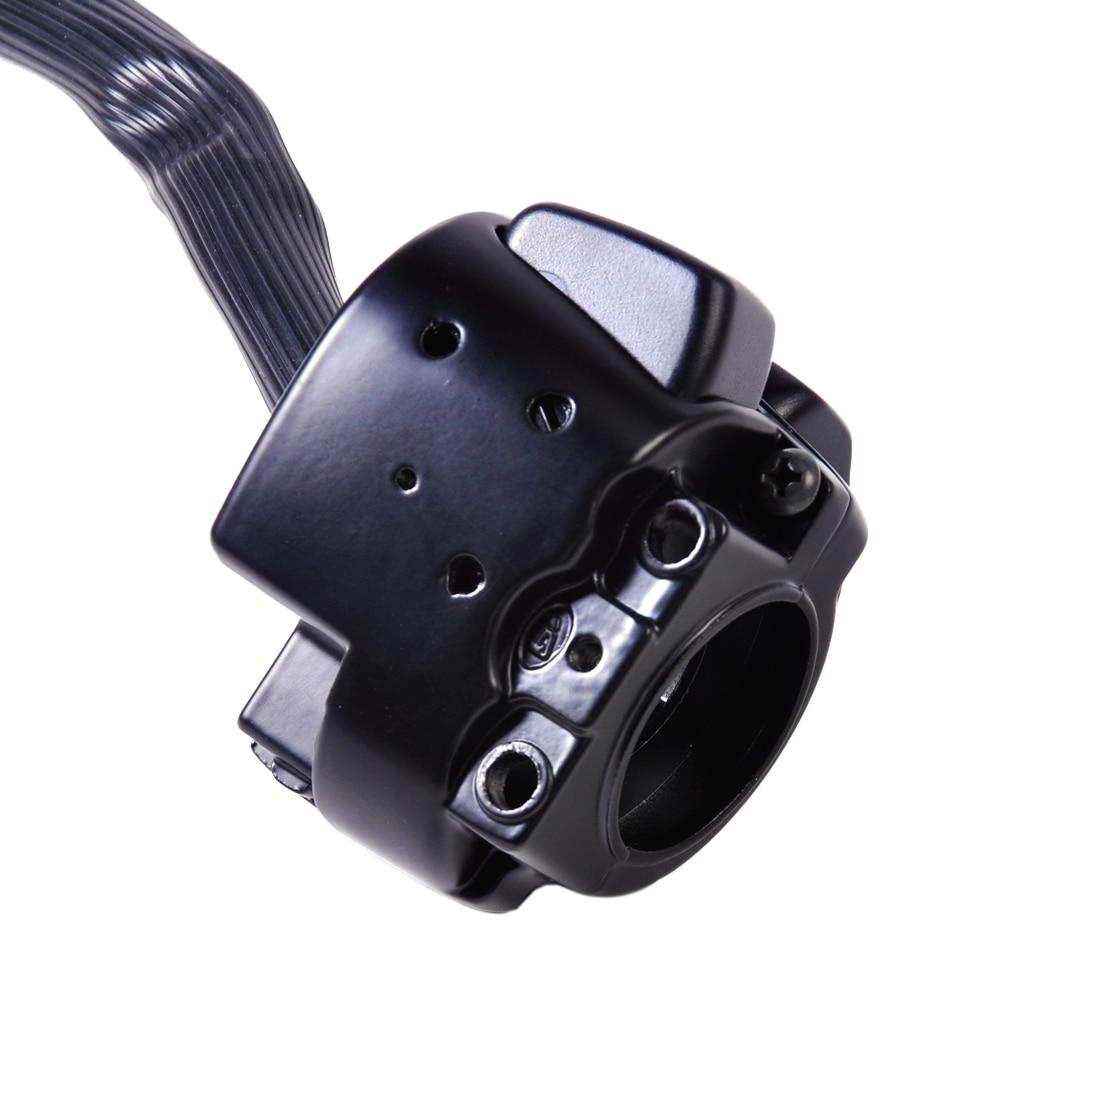 Dwcx New Motorcycle 1 Handlebar Ignition Kill Switch Wiring Harness 2014 Harley Davidson Trailer Aeproductgetsubject